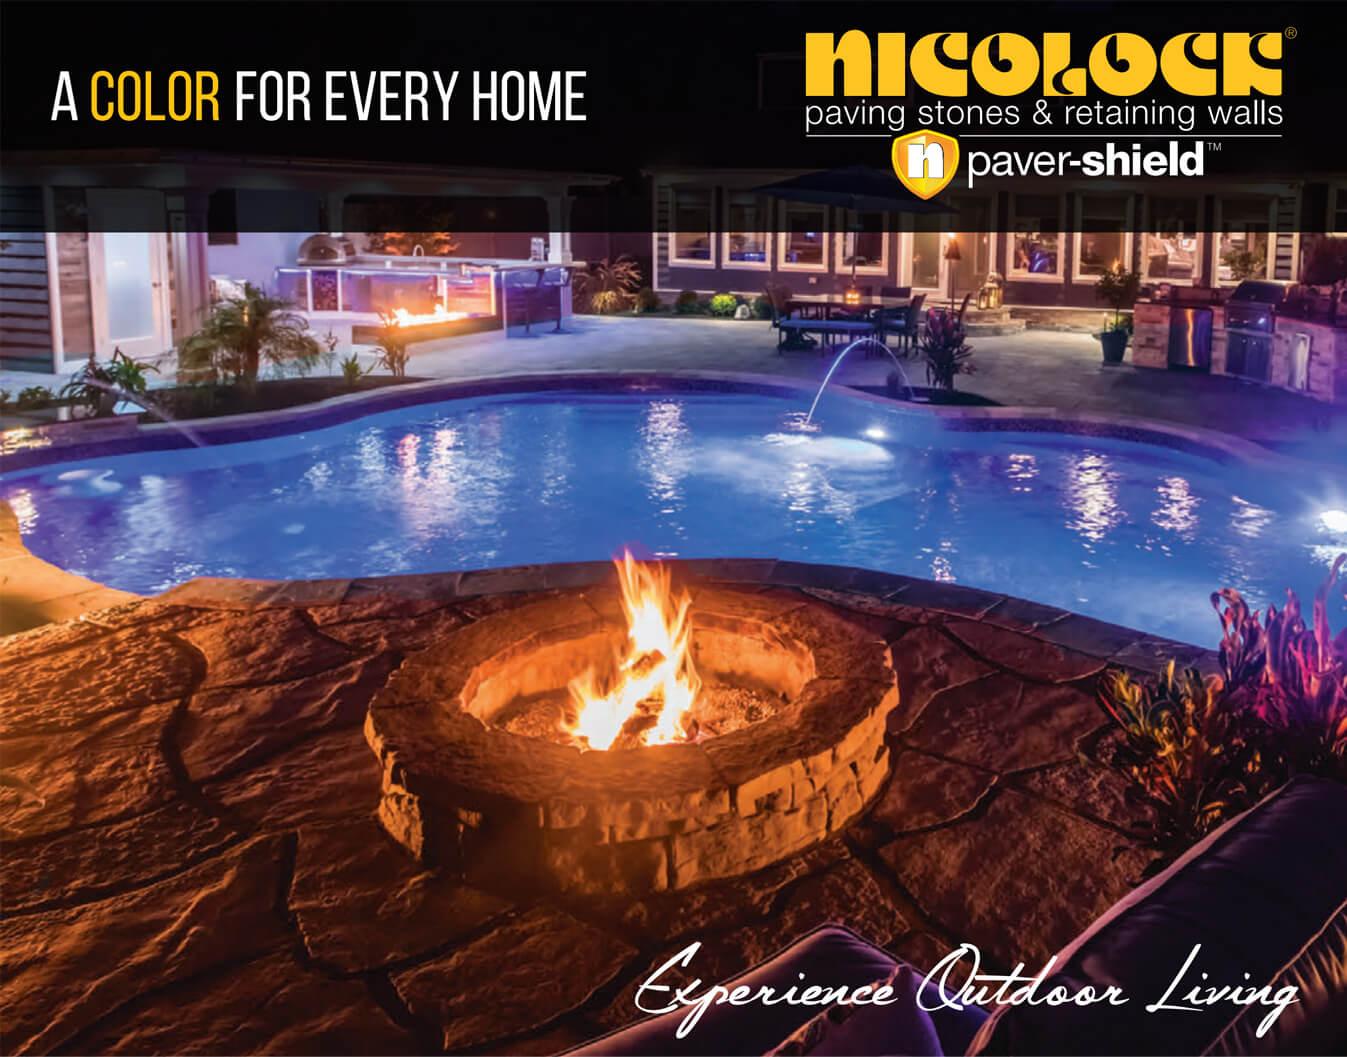 Nicolock catalog